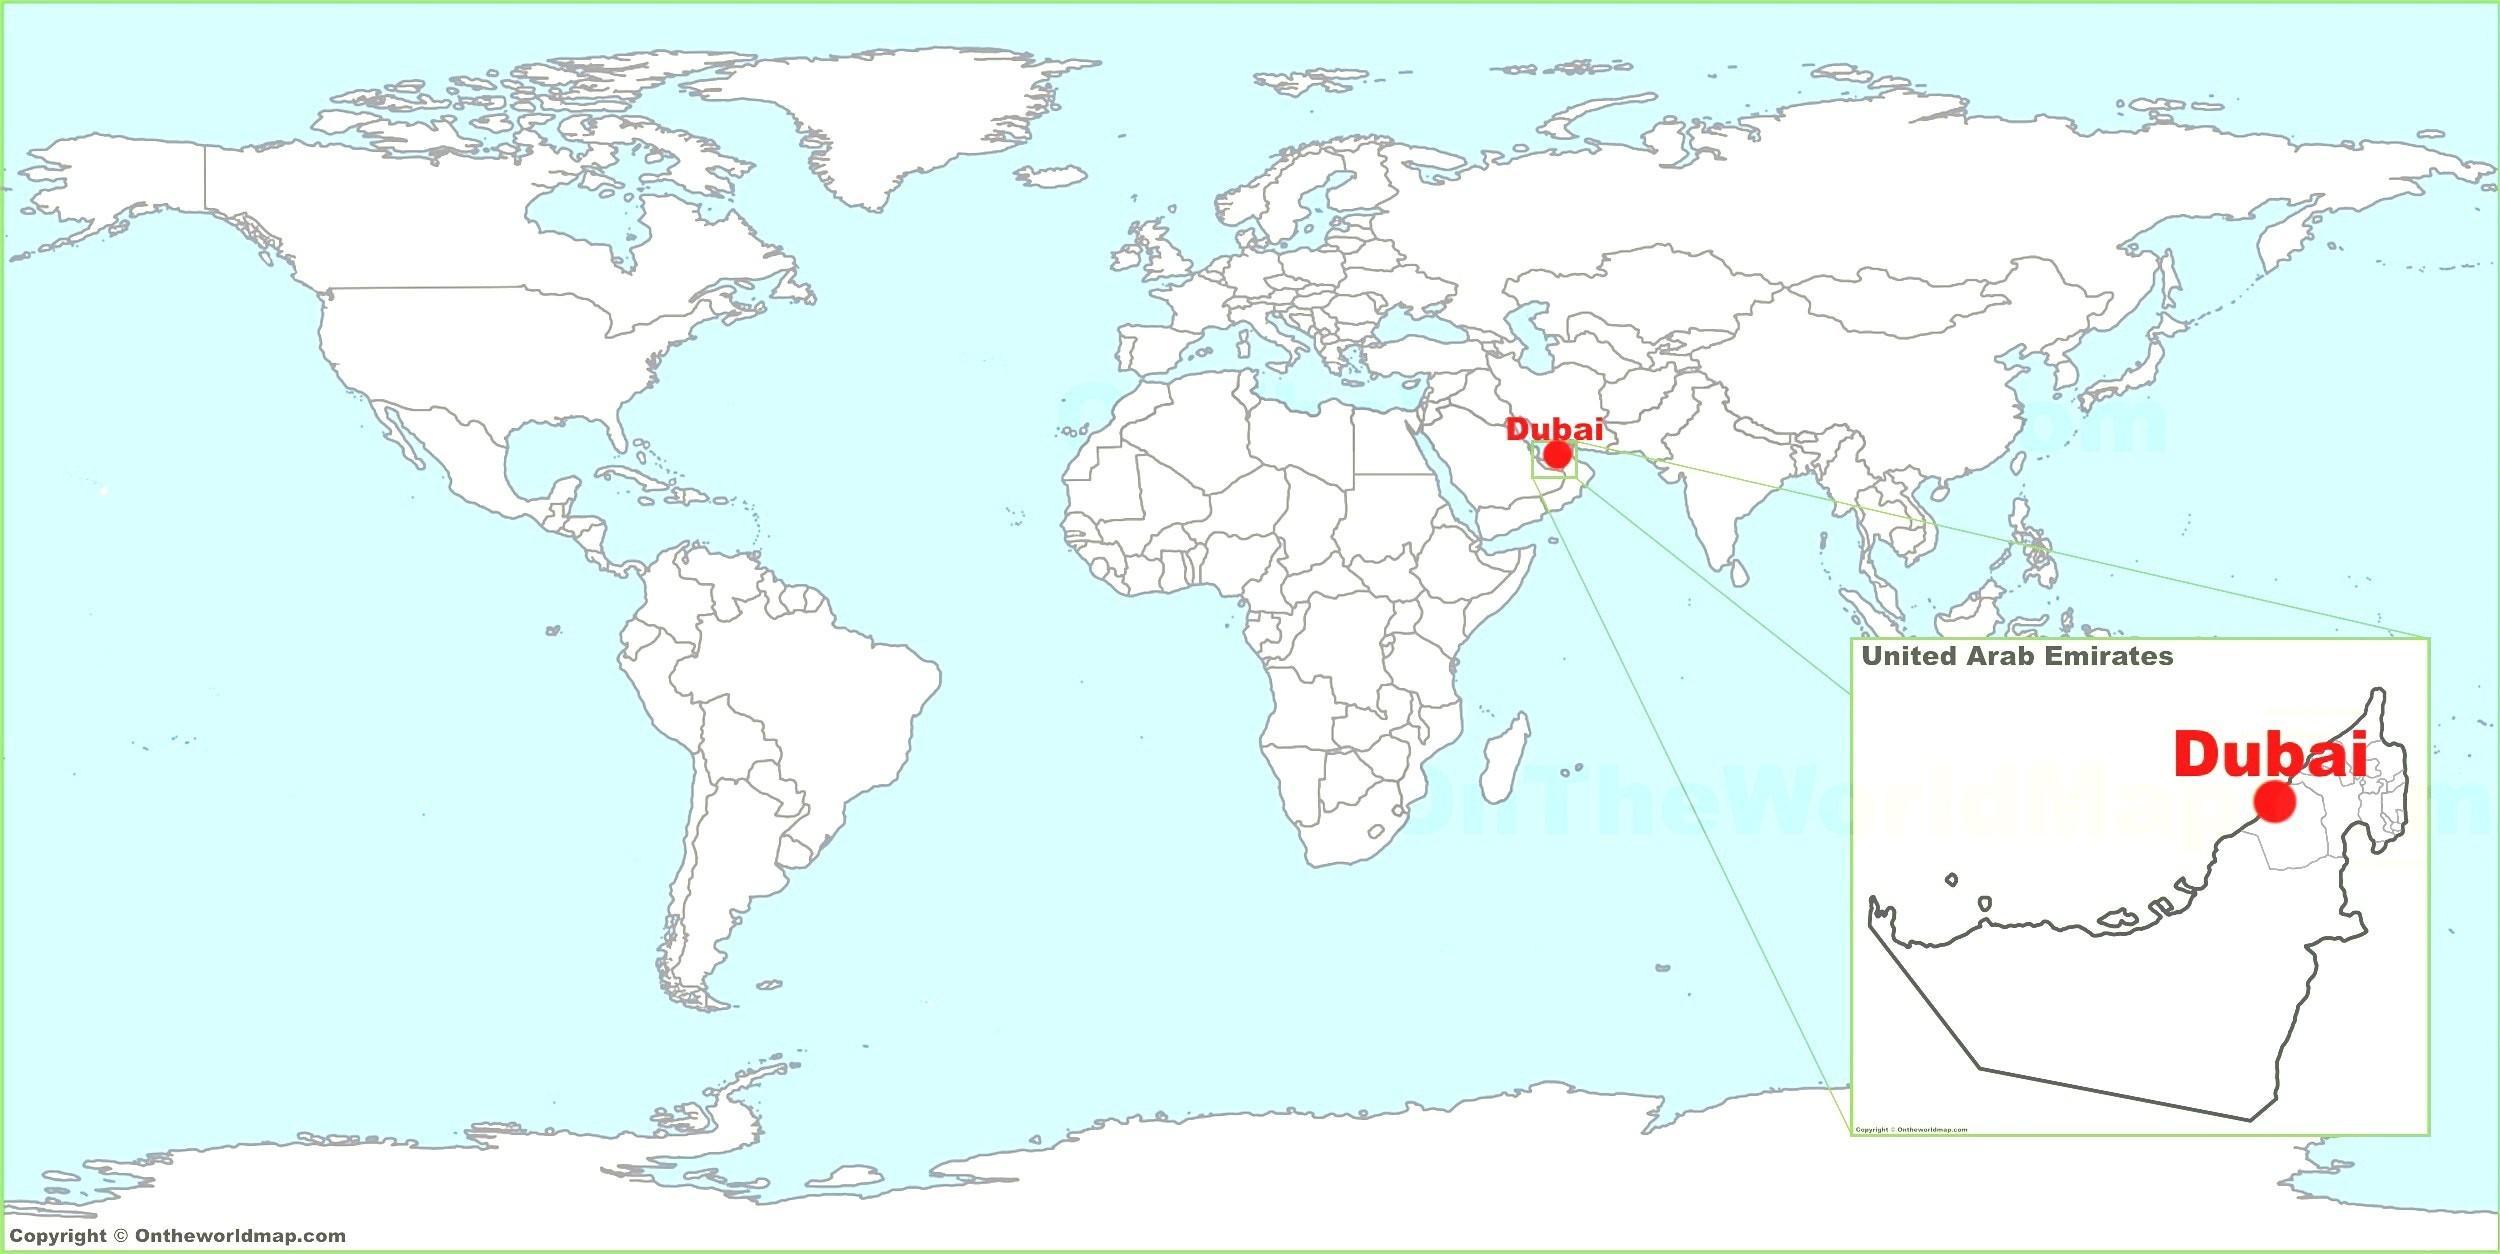 Dubaj V Mape Sveta Dubaj Mapu Vo Svete Spojene Arabske Emiraty